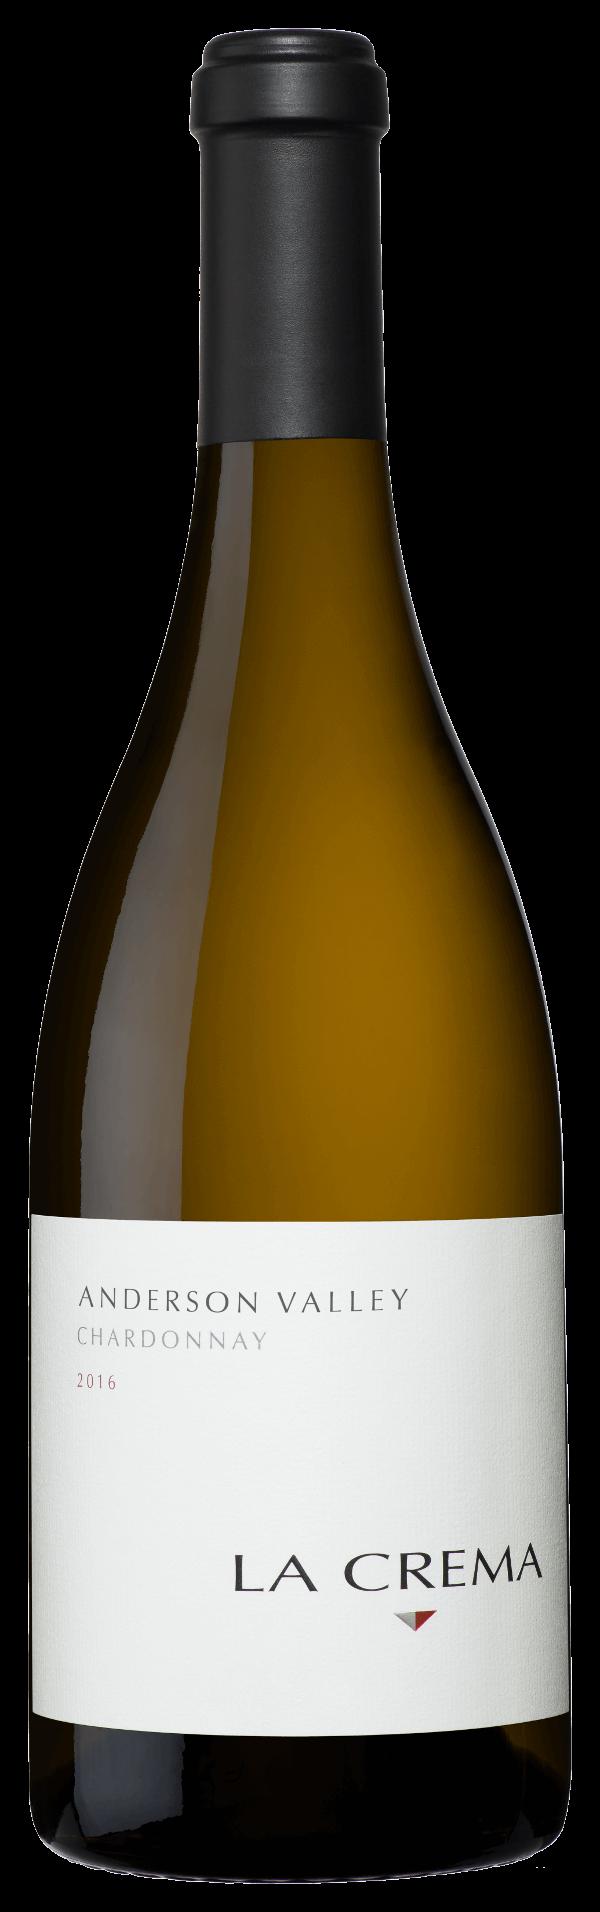 2016 Anderson Valley Chardonnay